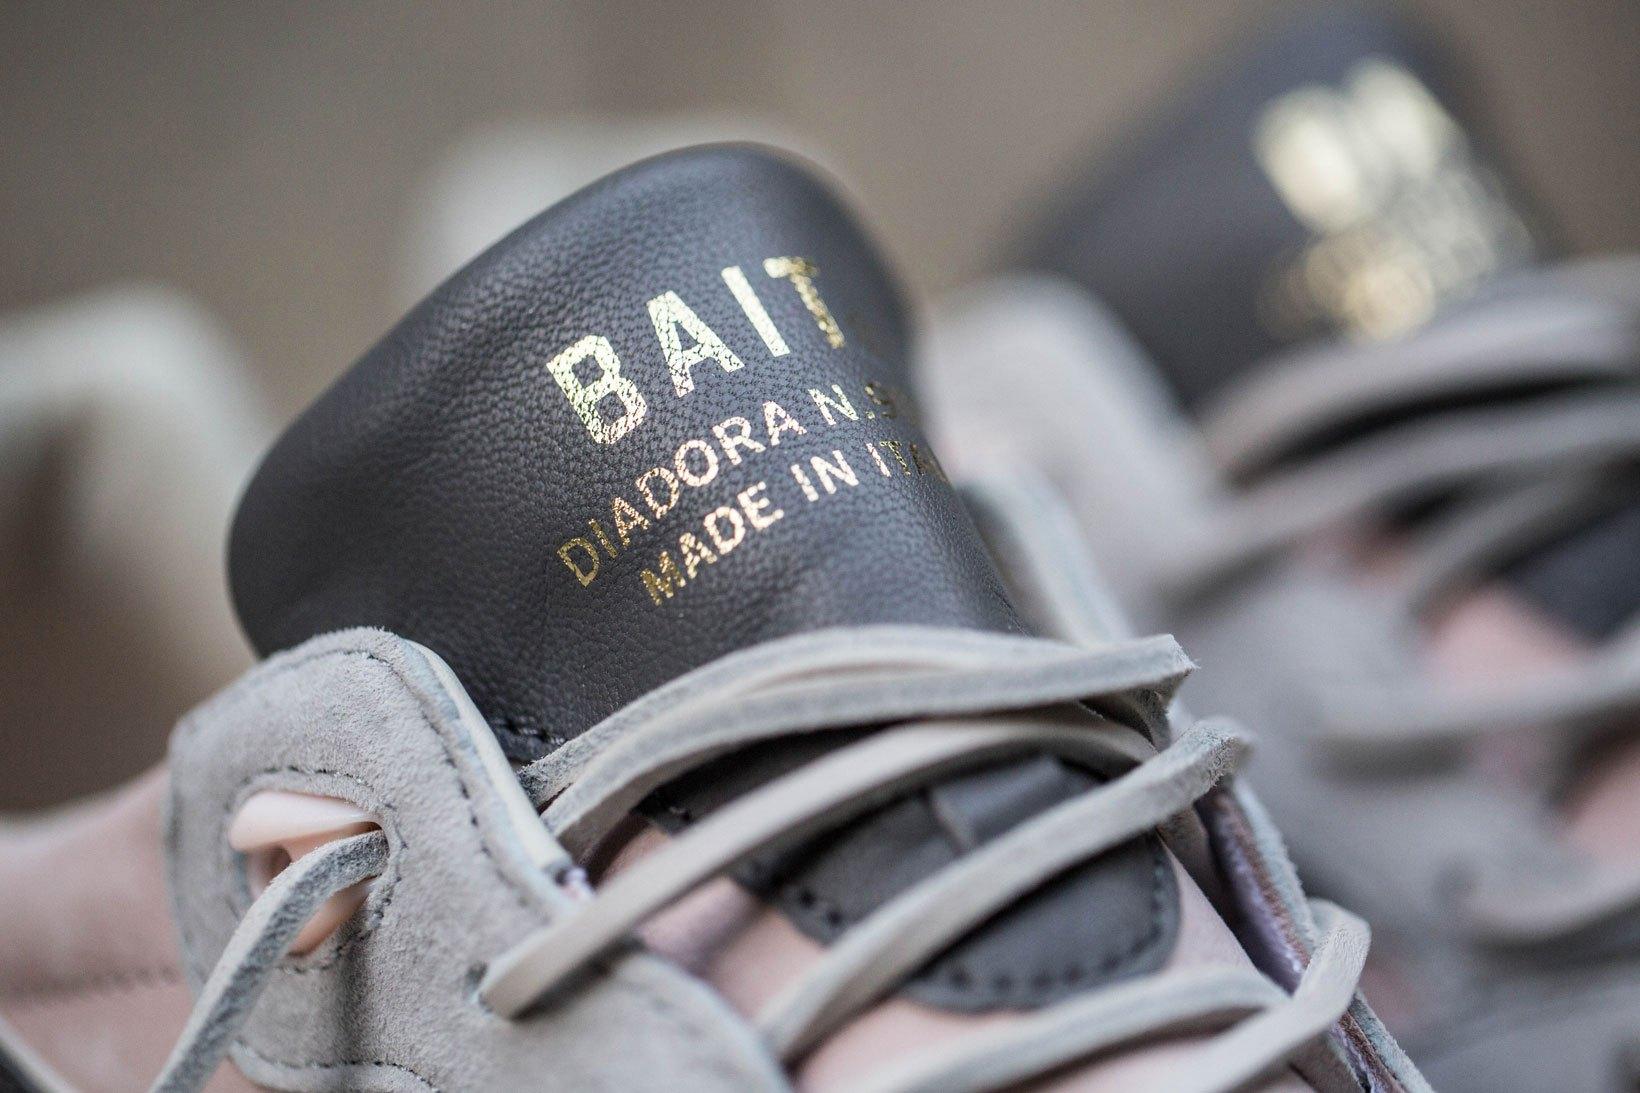 BAIT x Diadora - TRENDS periodical